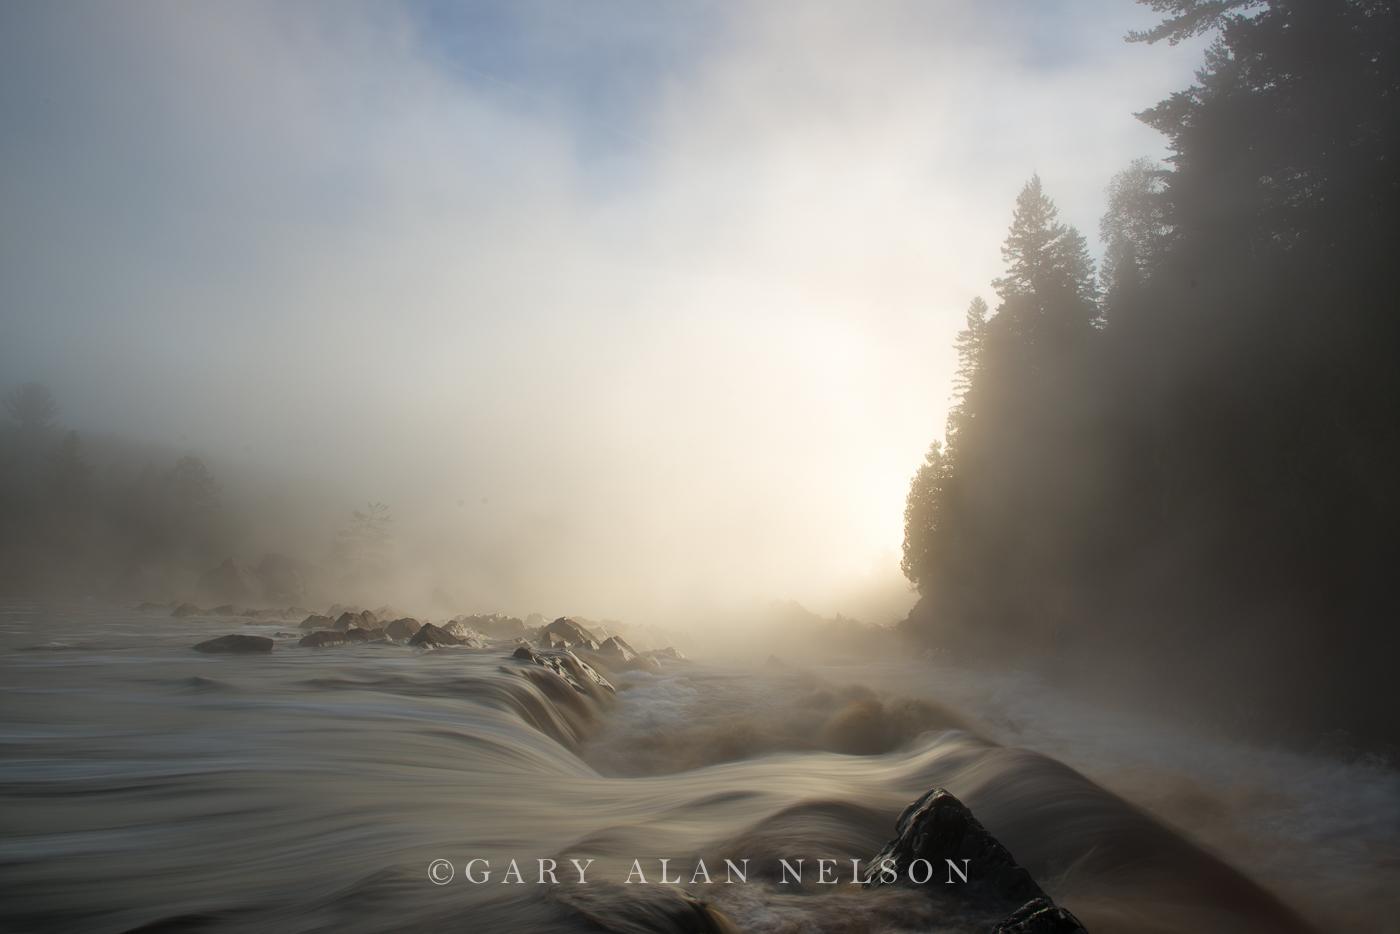 River,St. Louis River,Sunrise,fog,j. cooke,minnesota,morning,motion,state park, photo